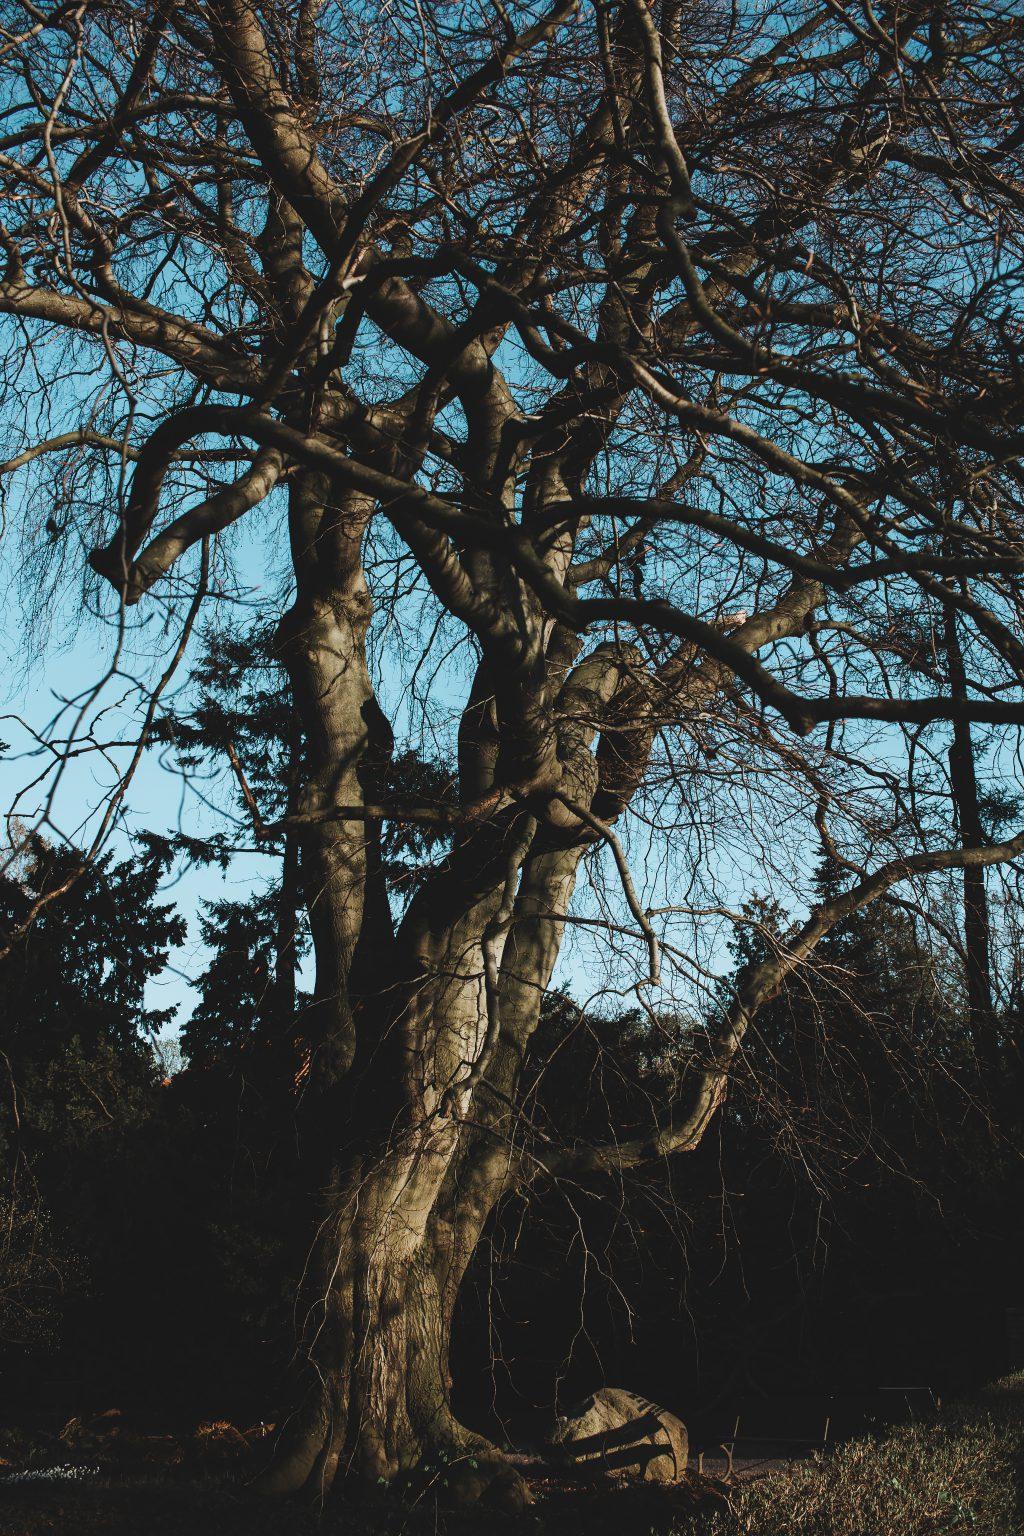 Old leafless tree - free stock photo